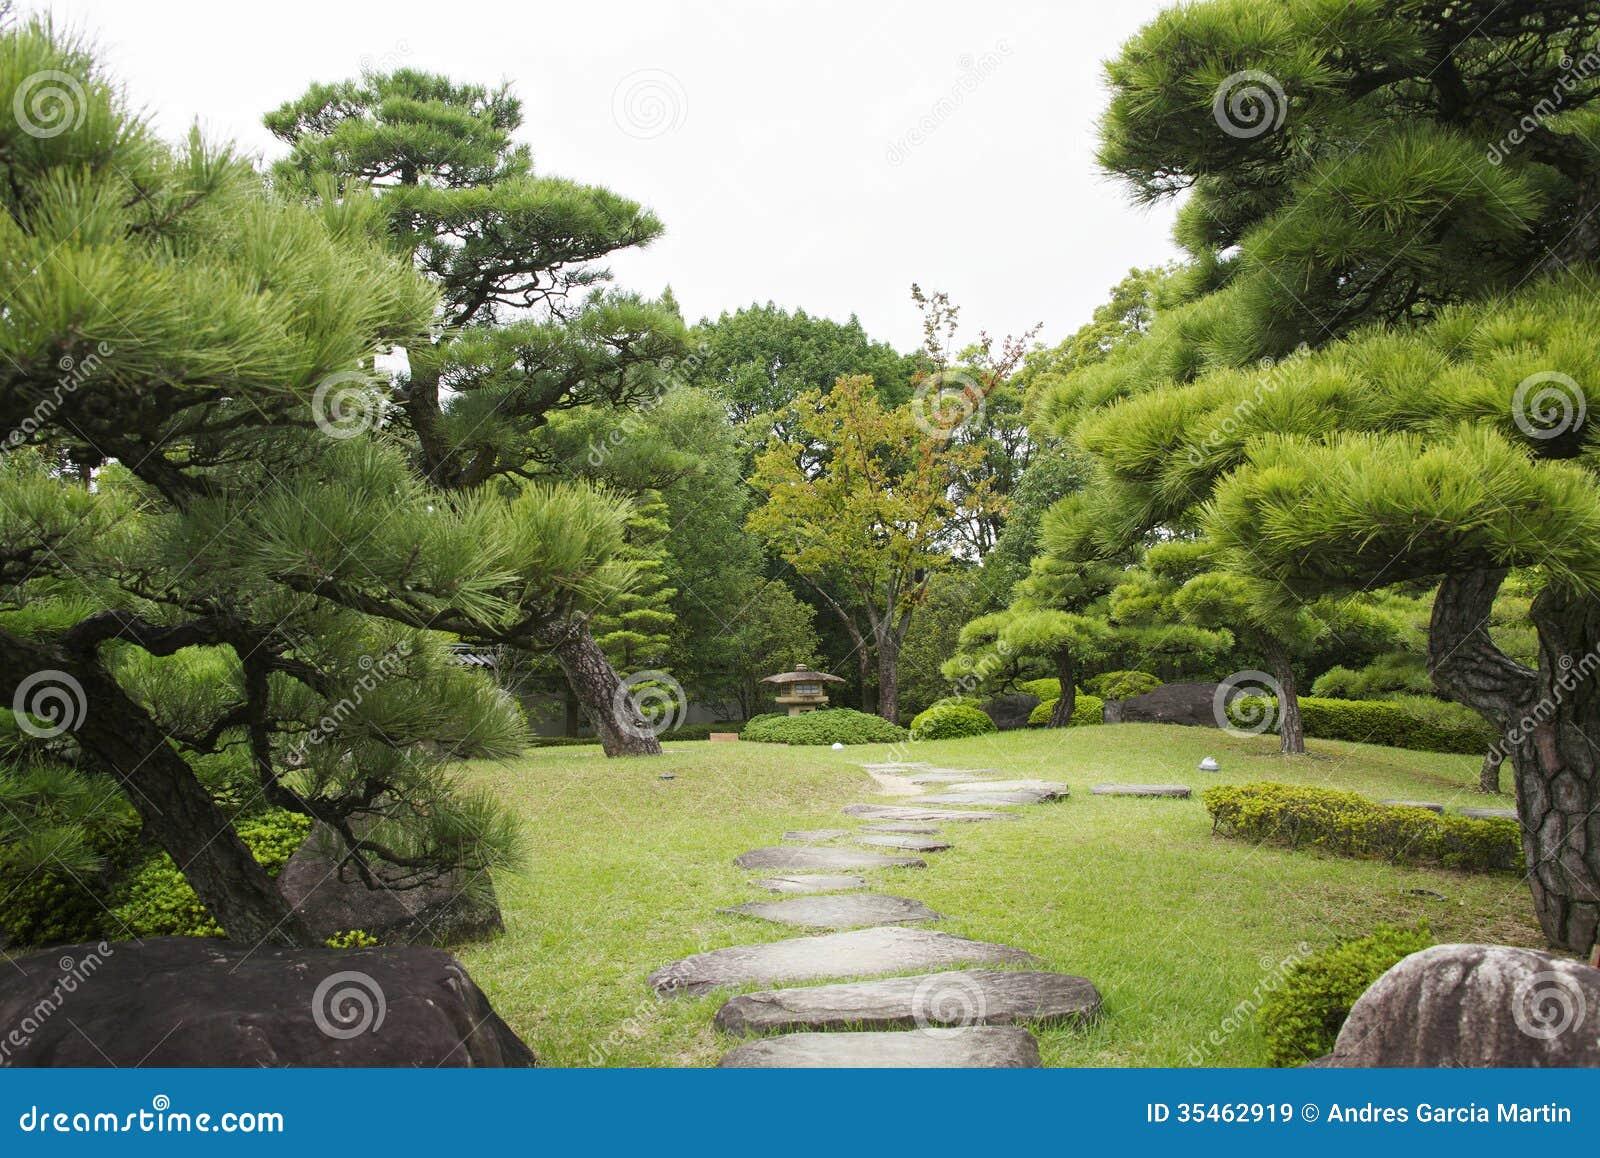 Jard n japon s en oto o temprano himeji for Jardines en otono